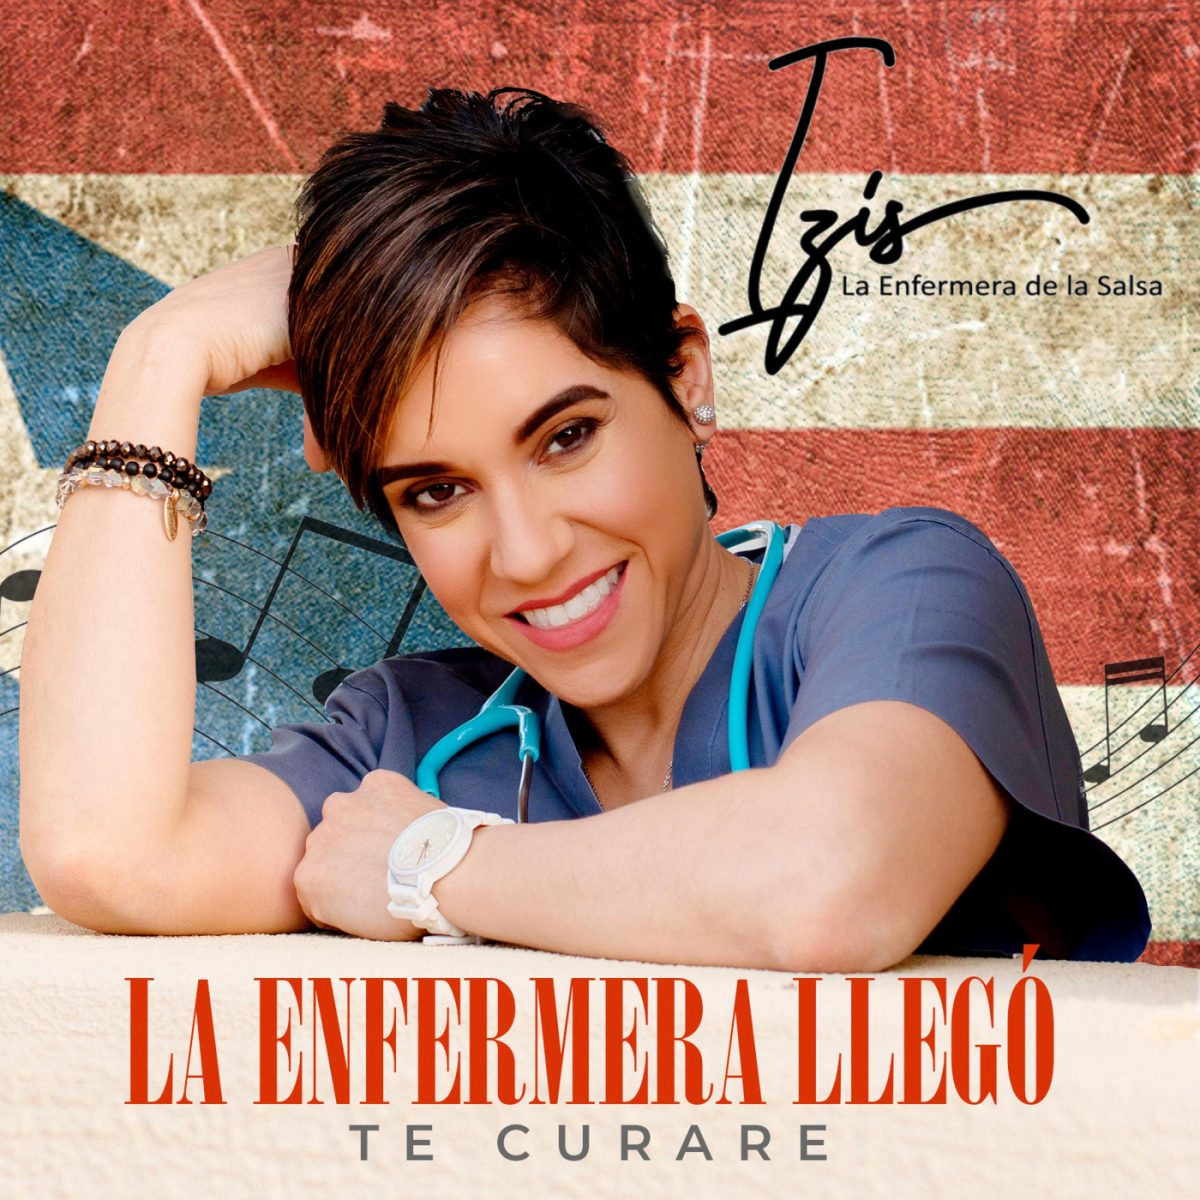 Izis La Enfermera De La Salsa – Te Curare | Solar Latin Club